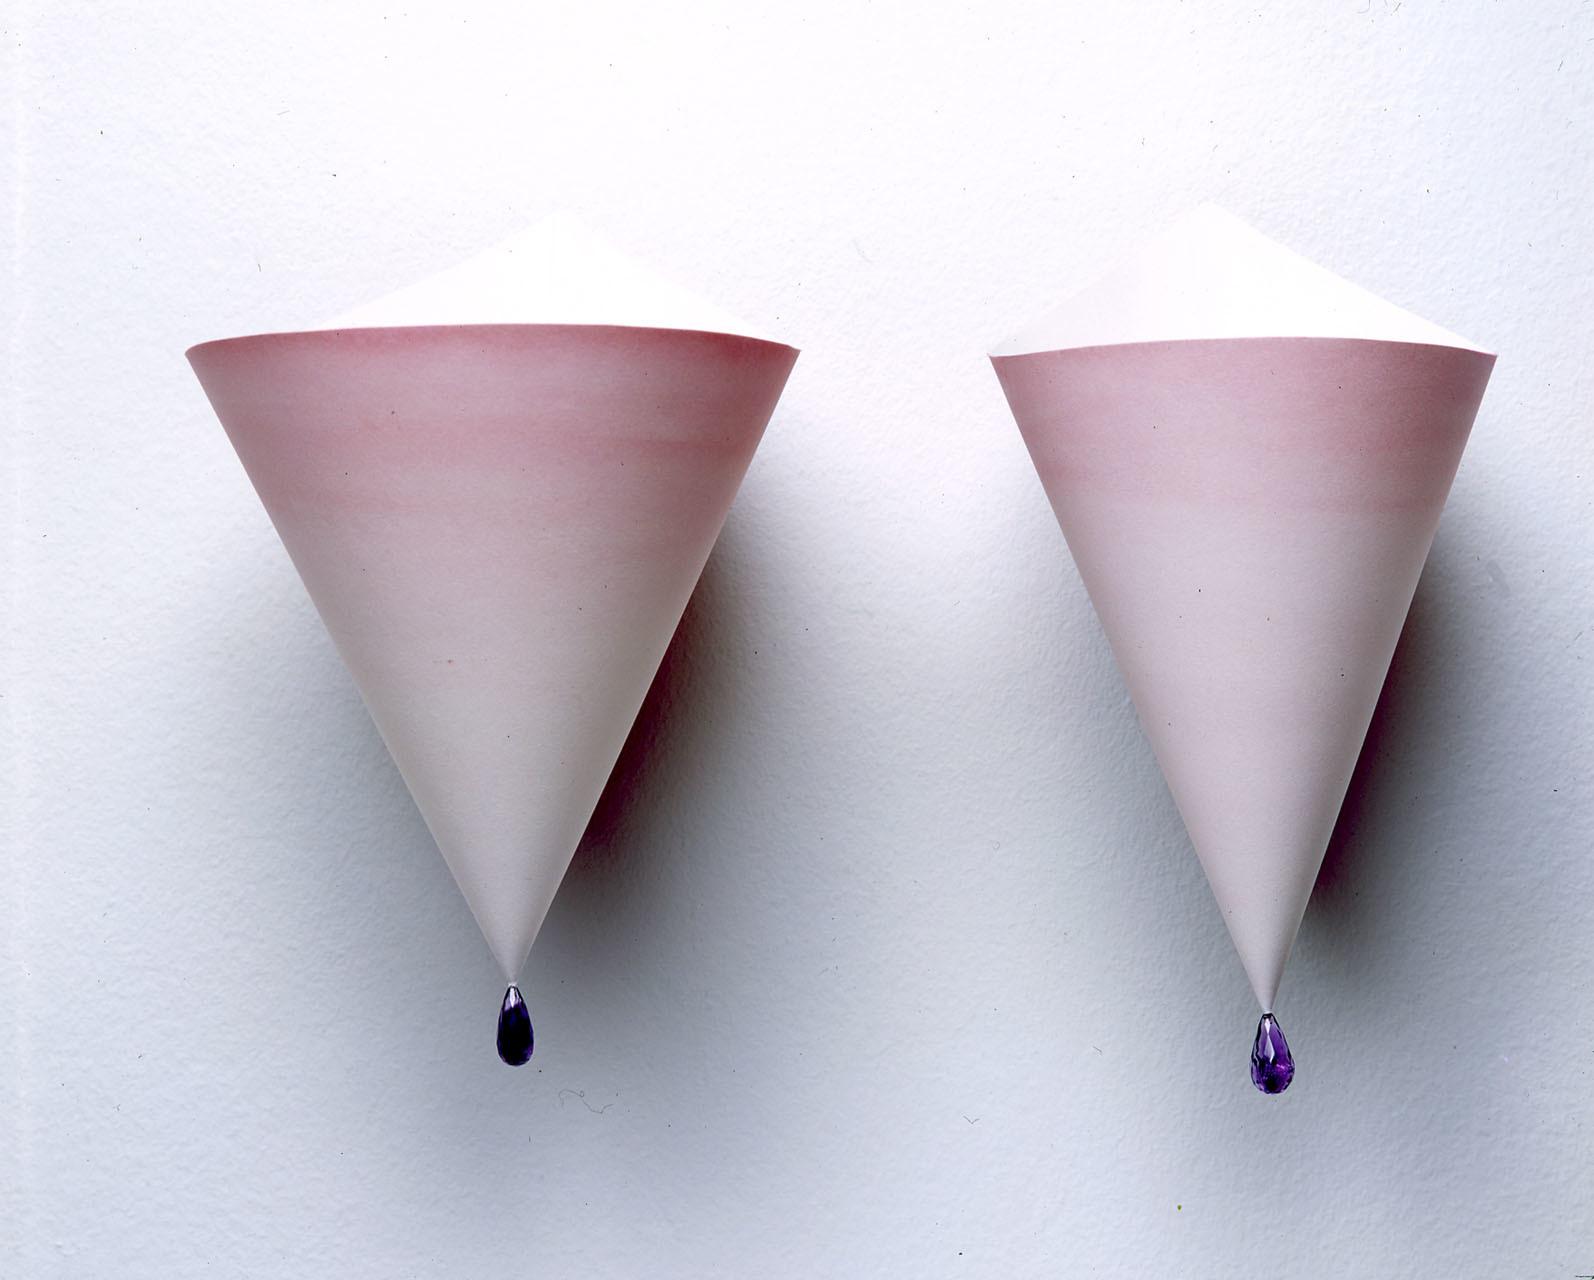 "<div class=""artwork_caption""><p>Untitled (amethyst), 2005</p></div>"